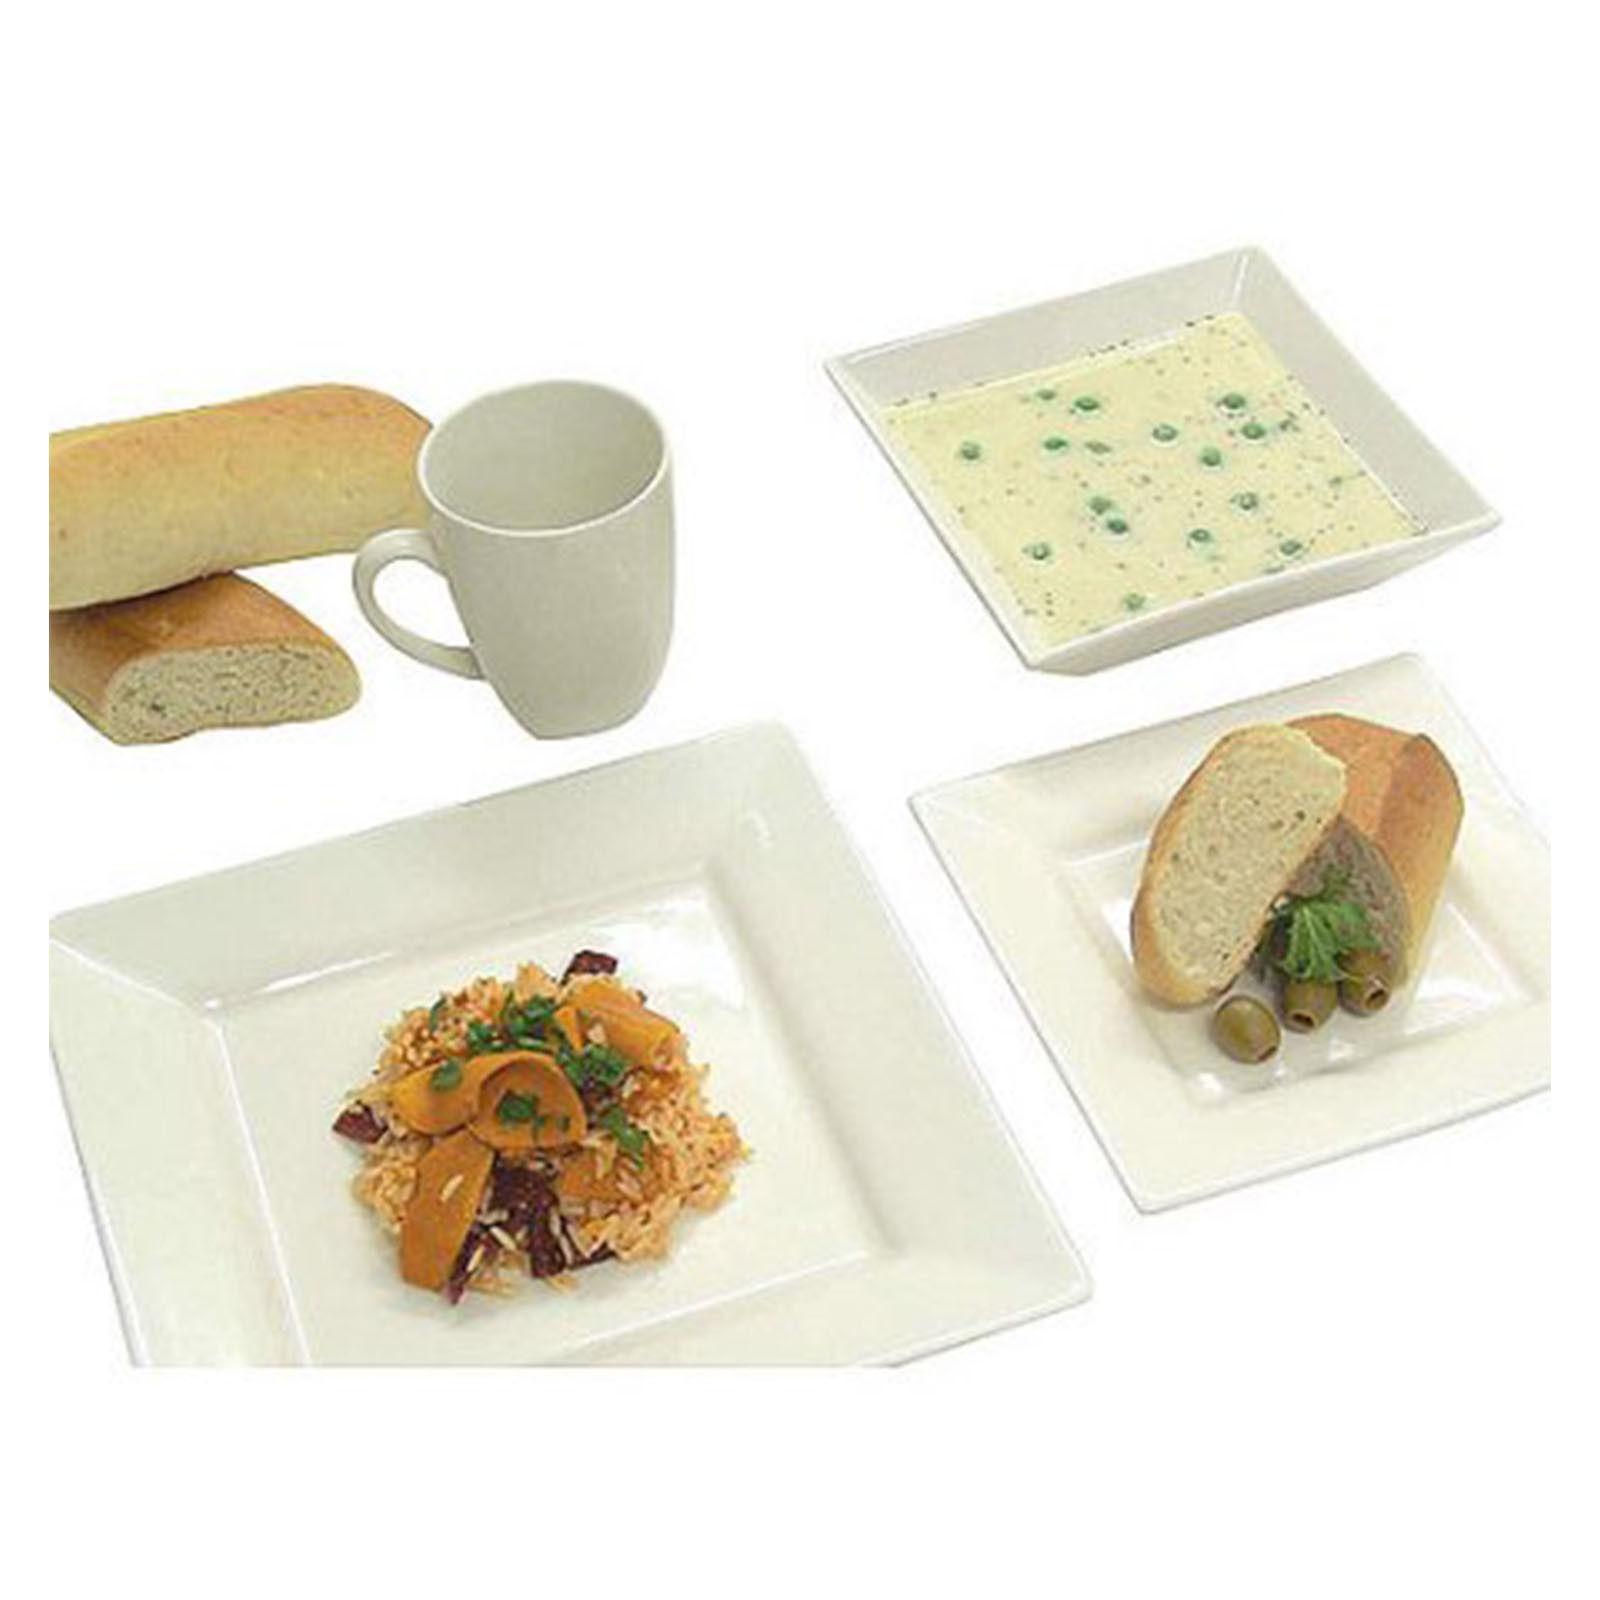 Square Porcelain Dishes Bowls